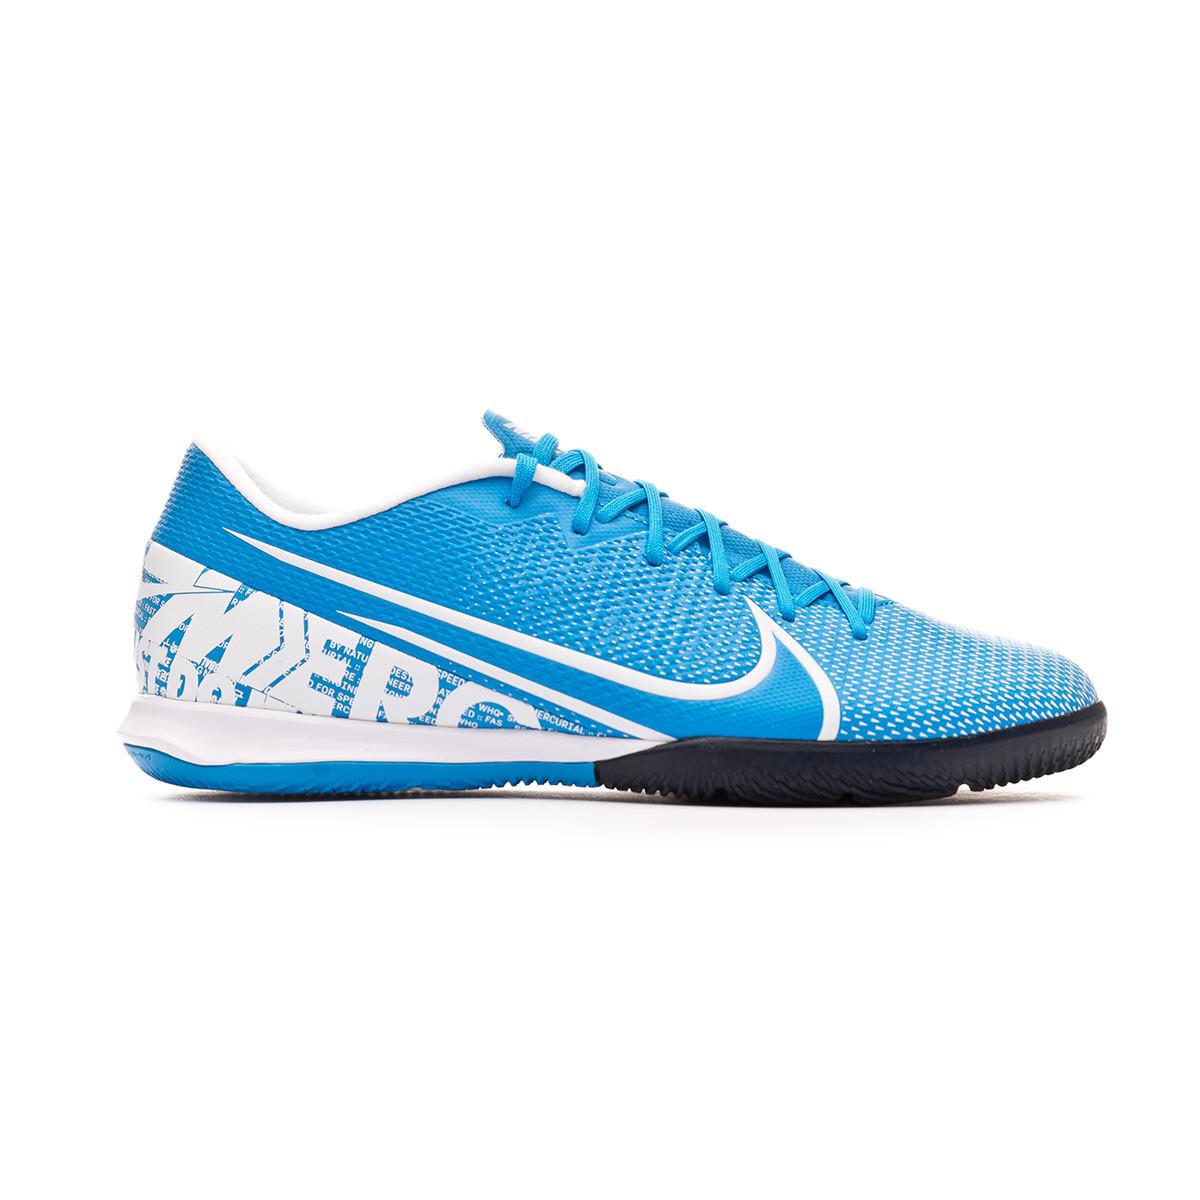 Chaussure de futsal Nike Mercurial Vapor XIII Academy IC